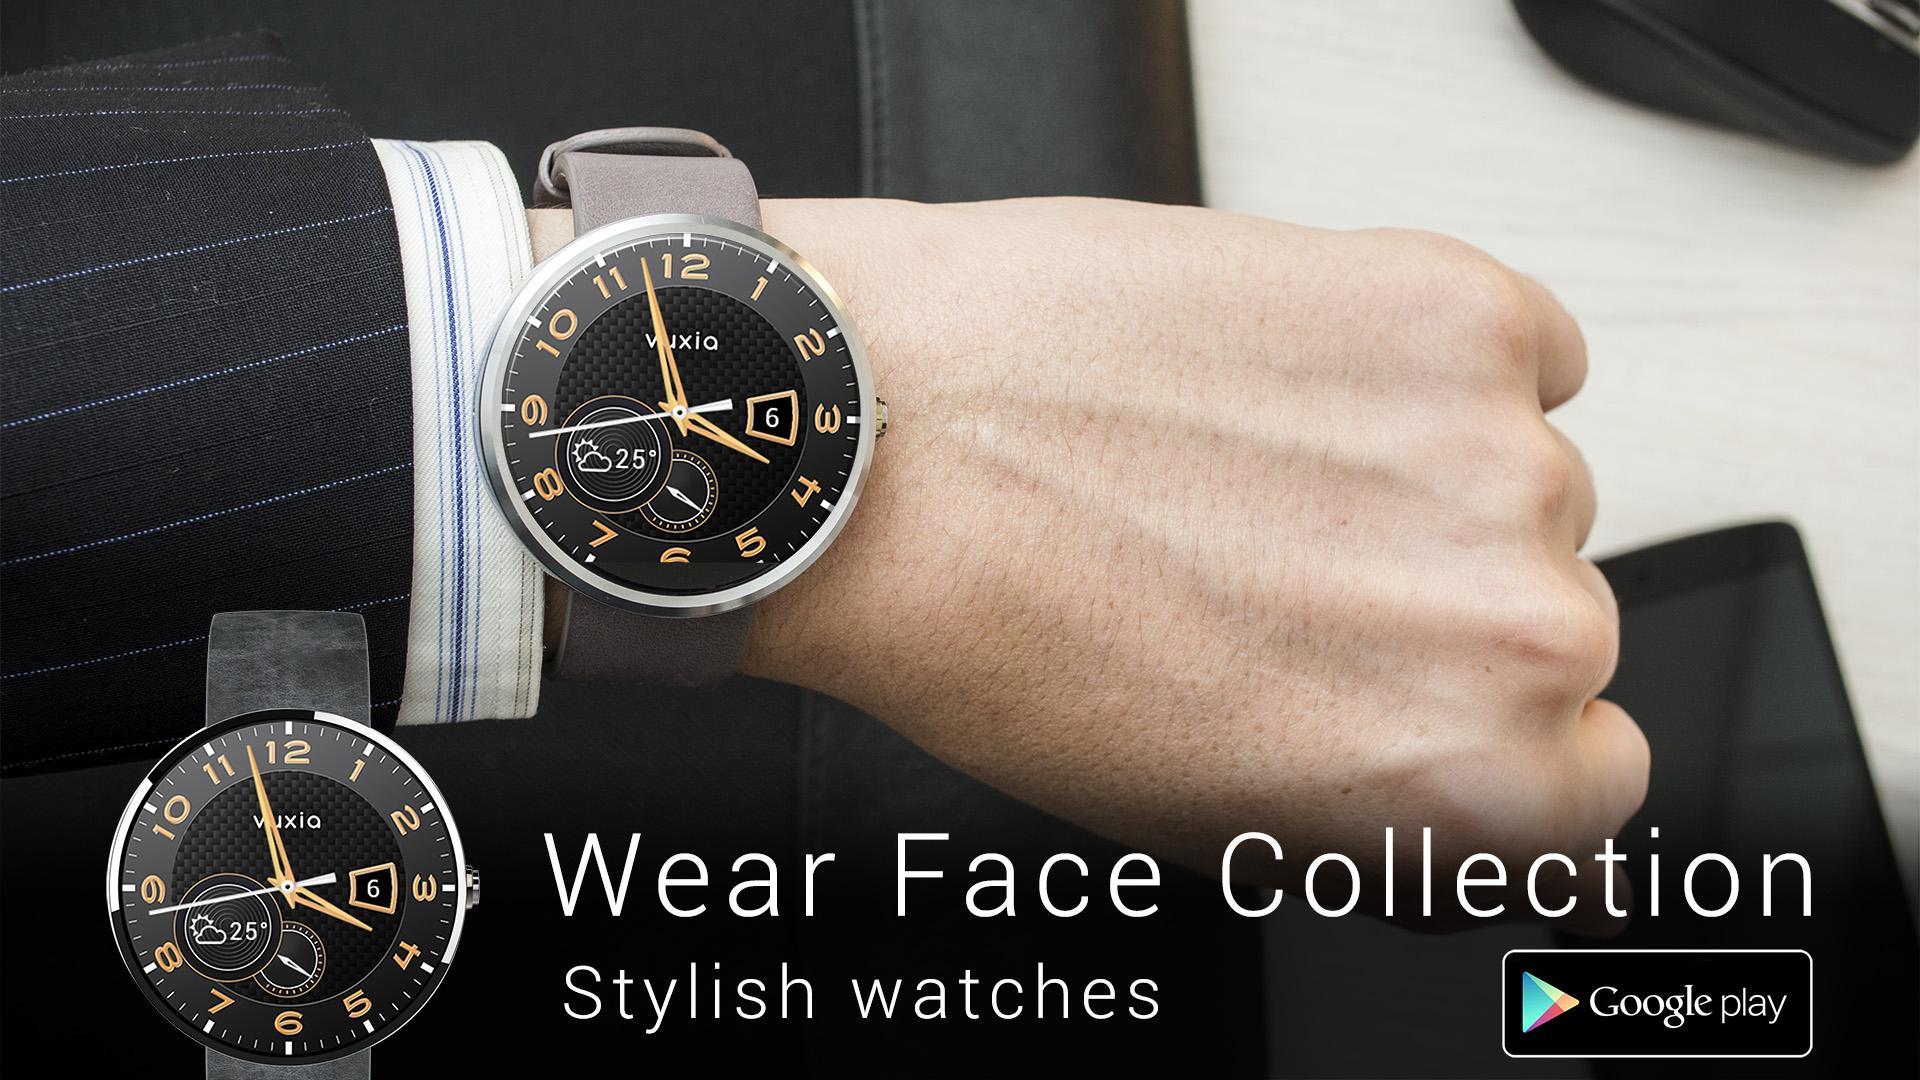 Wear face collection - Screenshots